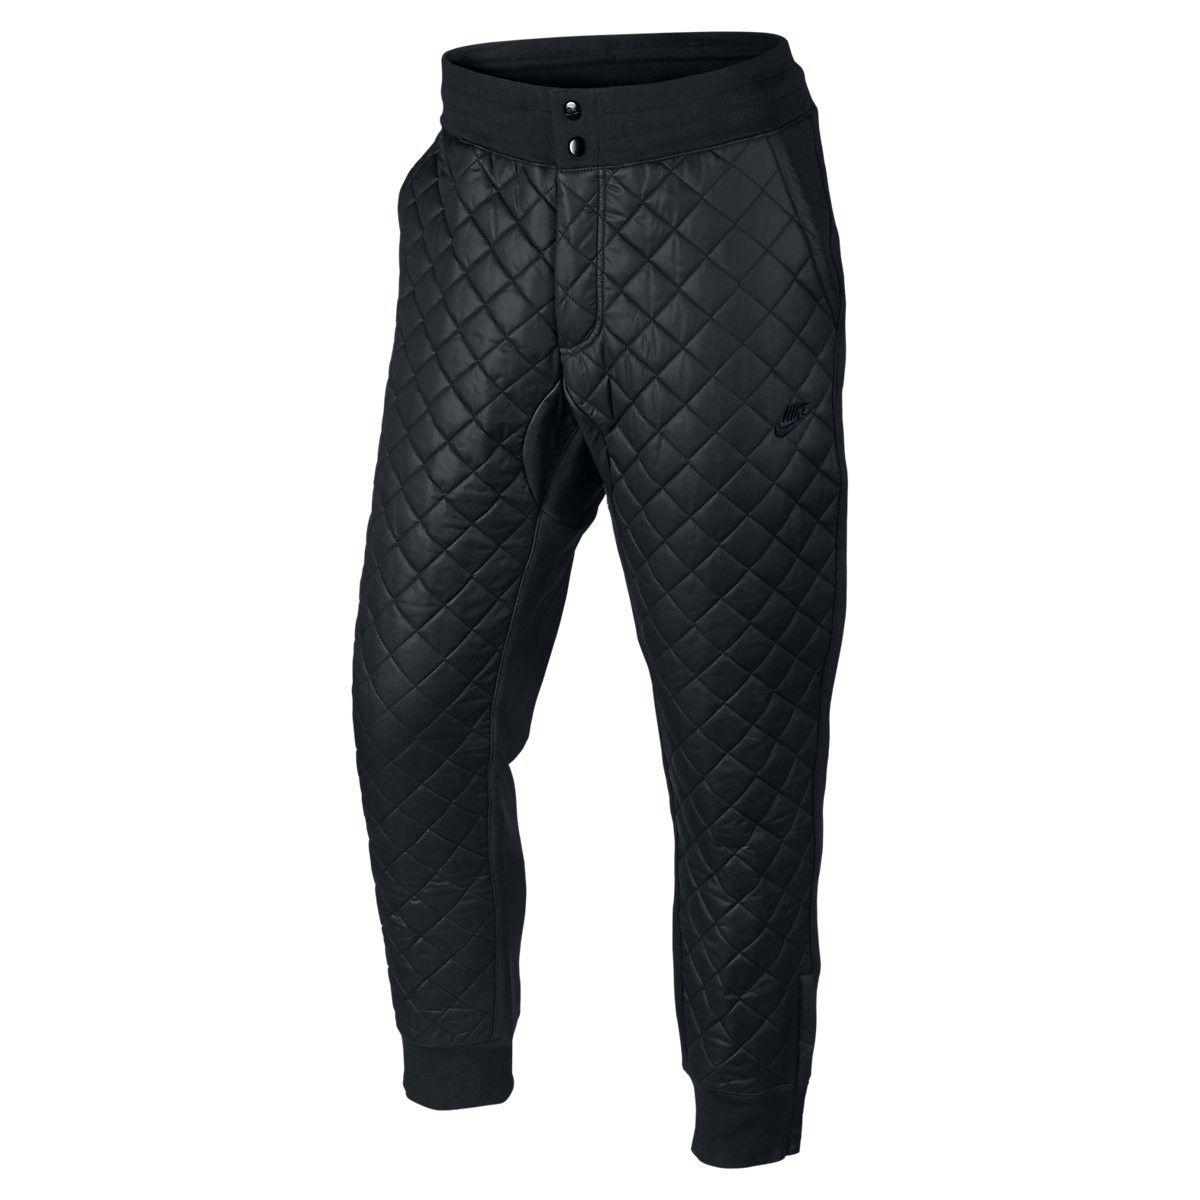 Pantalon de survêtement Nike V442 Fleece Cuffed - 678942-010